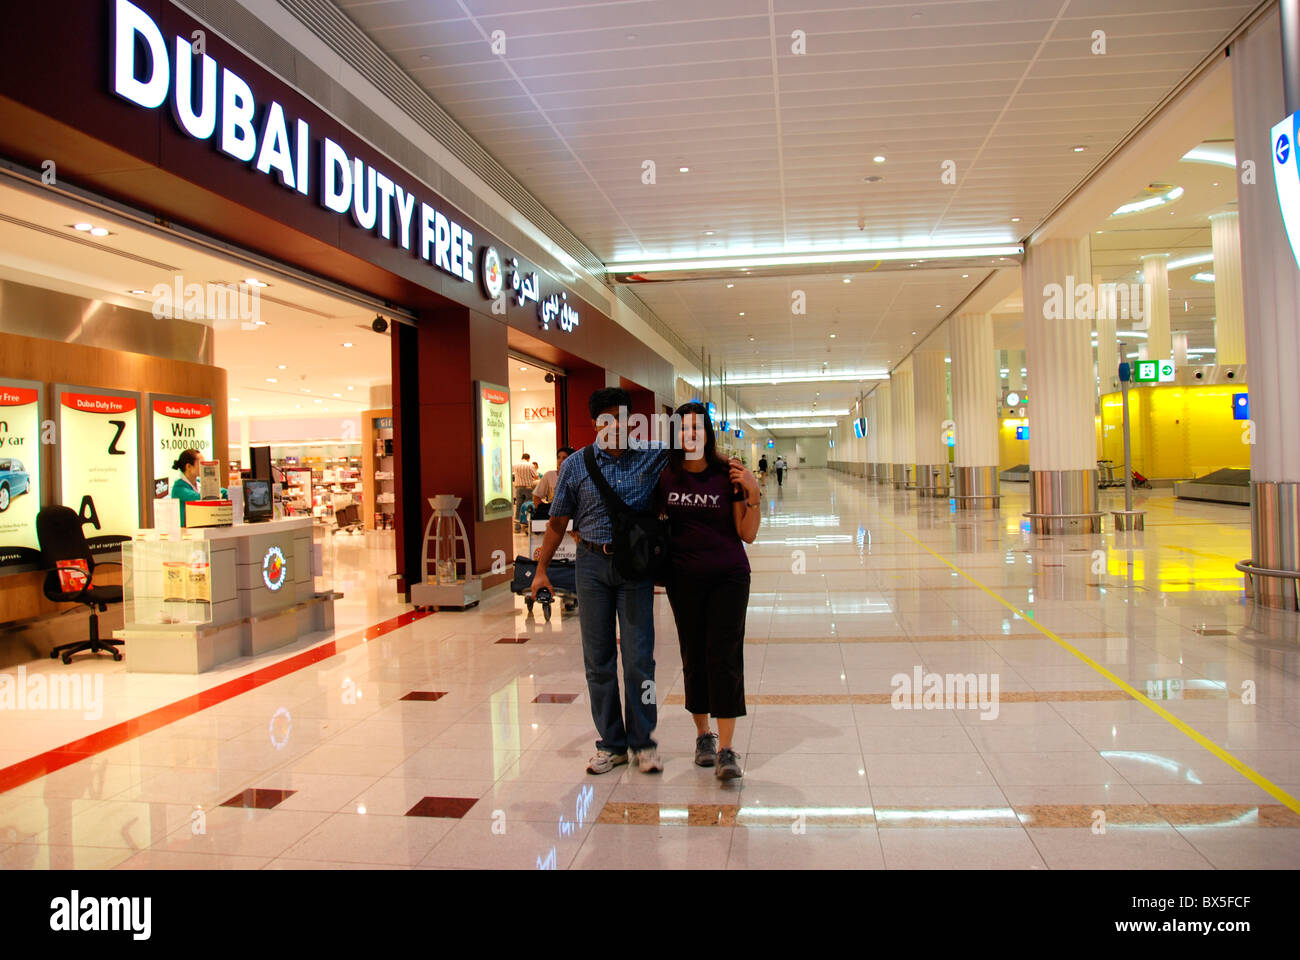 Dubai Duty Free Stock Photos Dubai Duty Free Stock Images Alamy